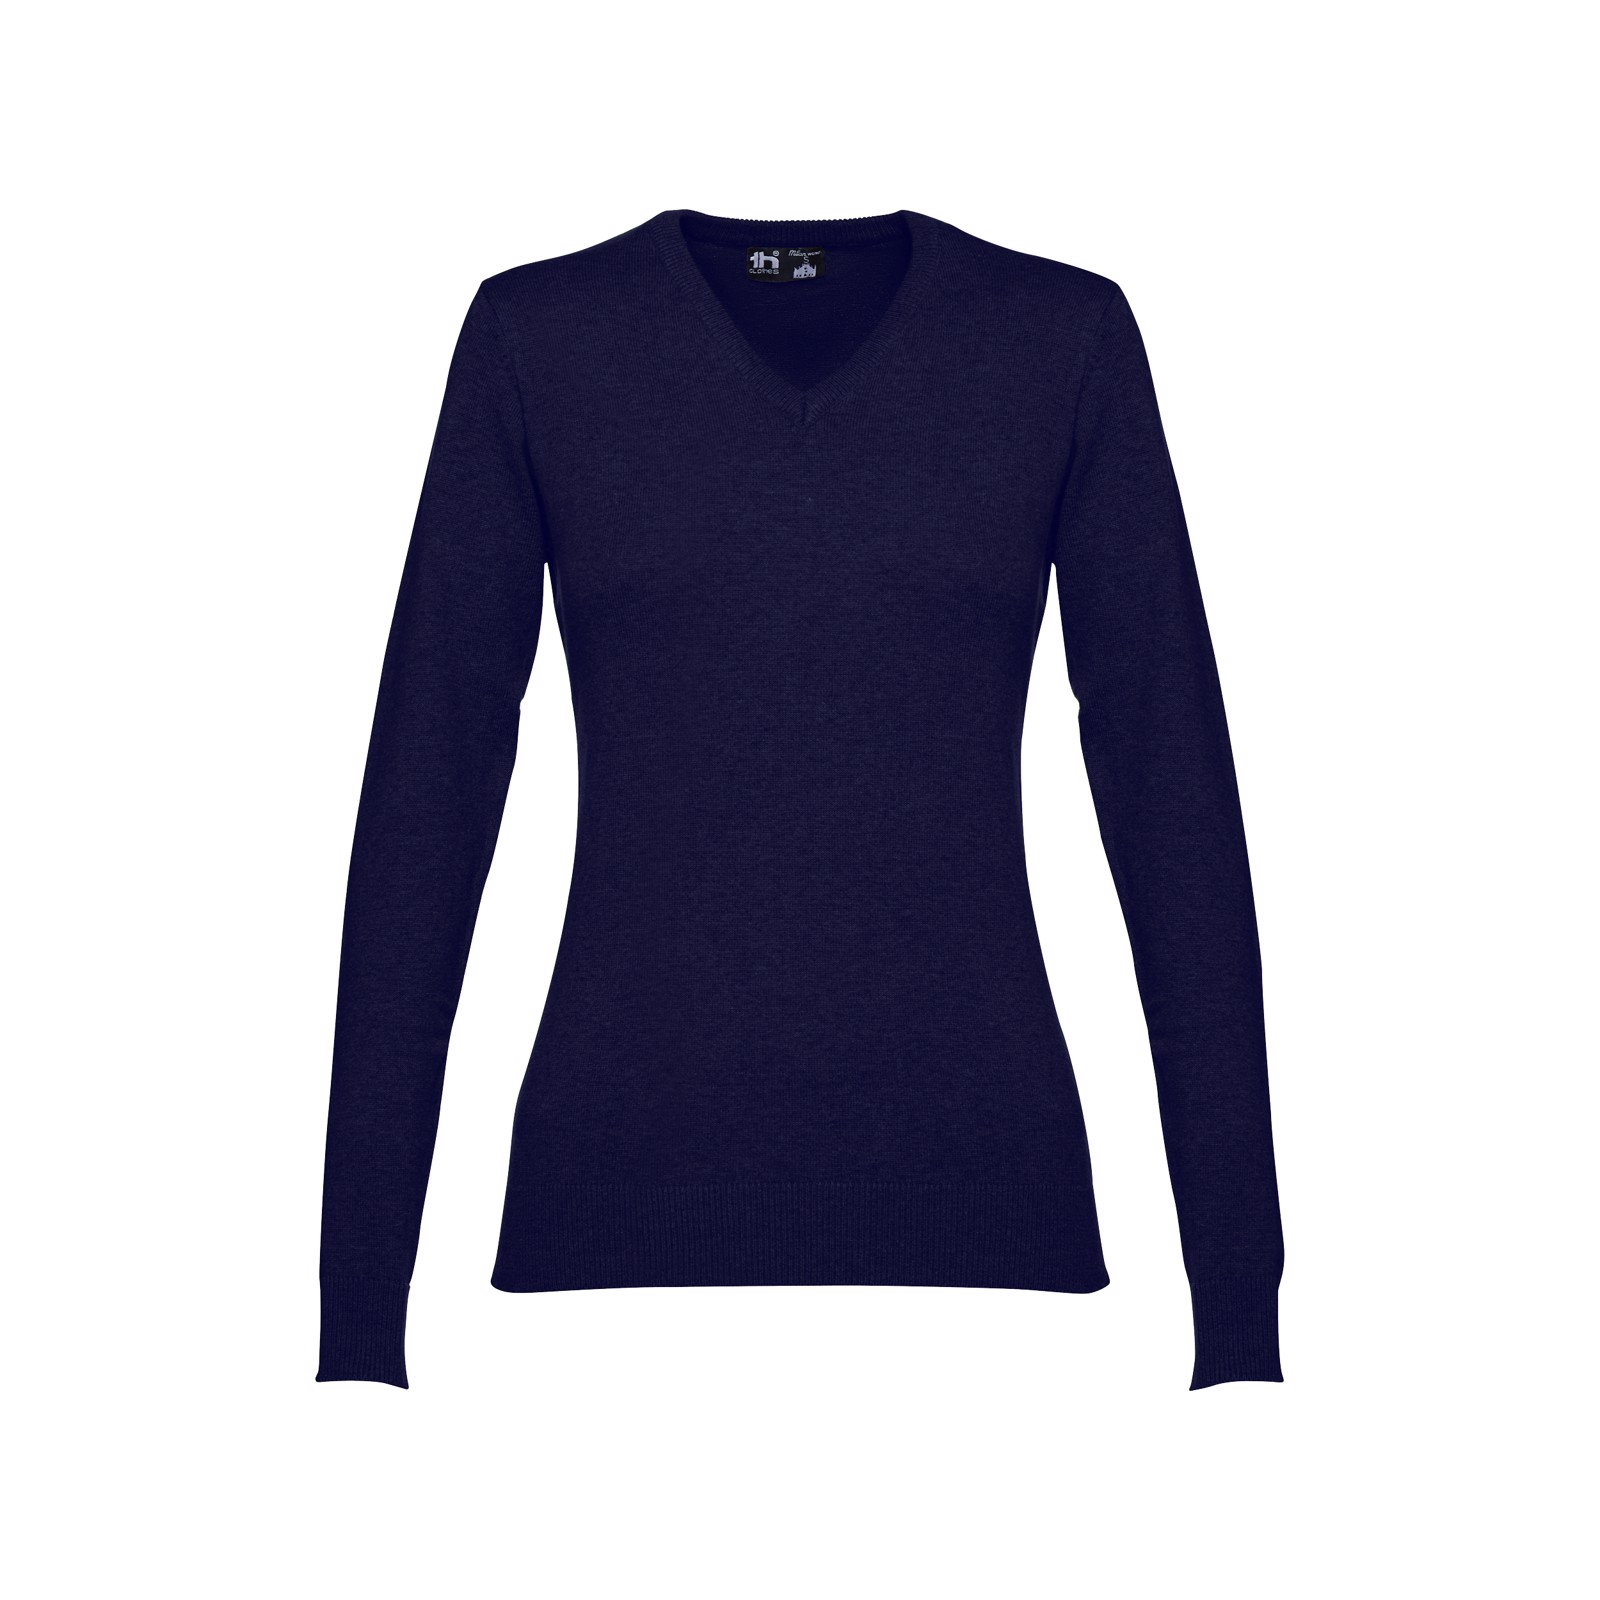 MILAN WOMEN. Γυναικείο πουλόβερ - λαιμόκοψη - Ναυτικό Μπλε / S